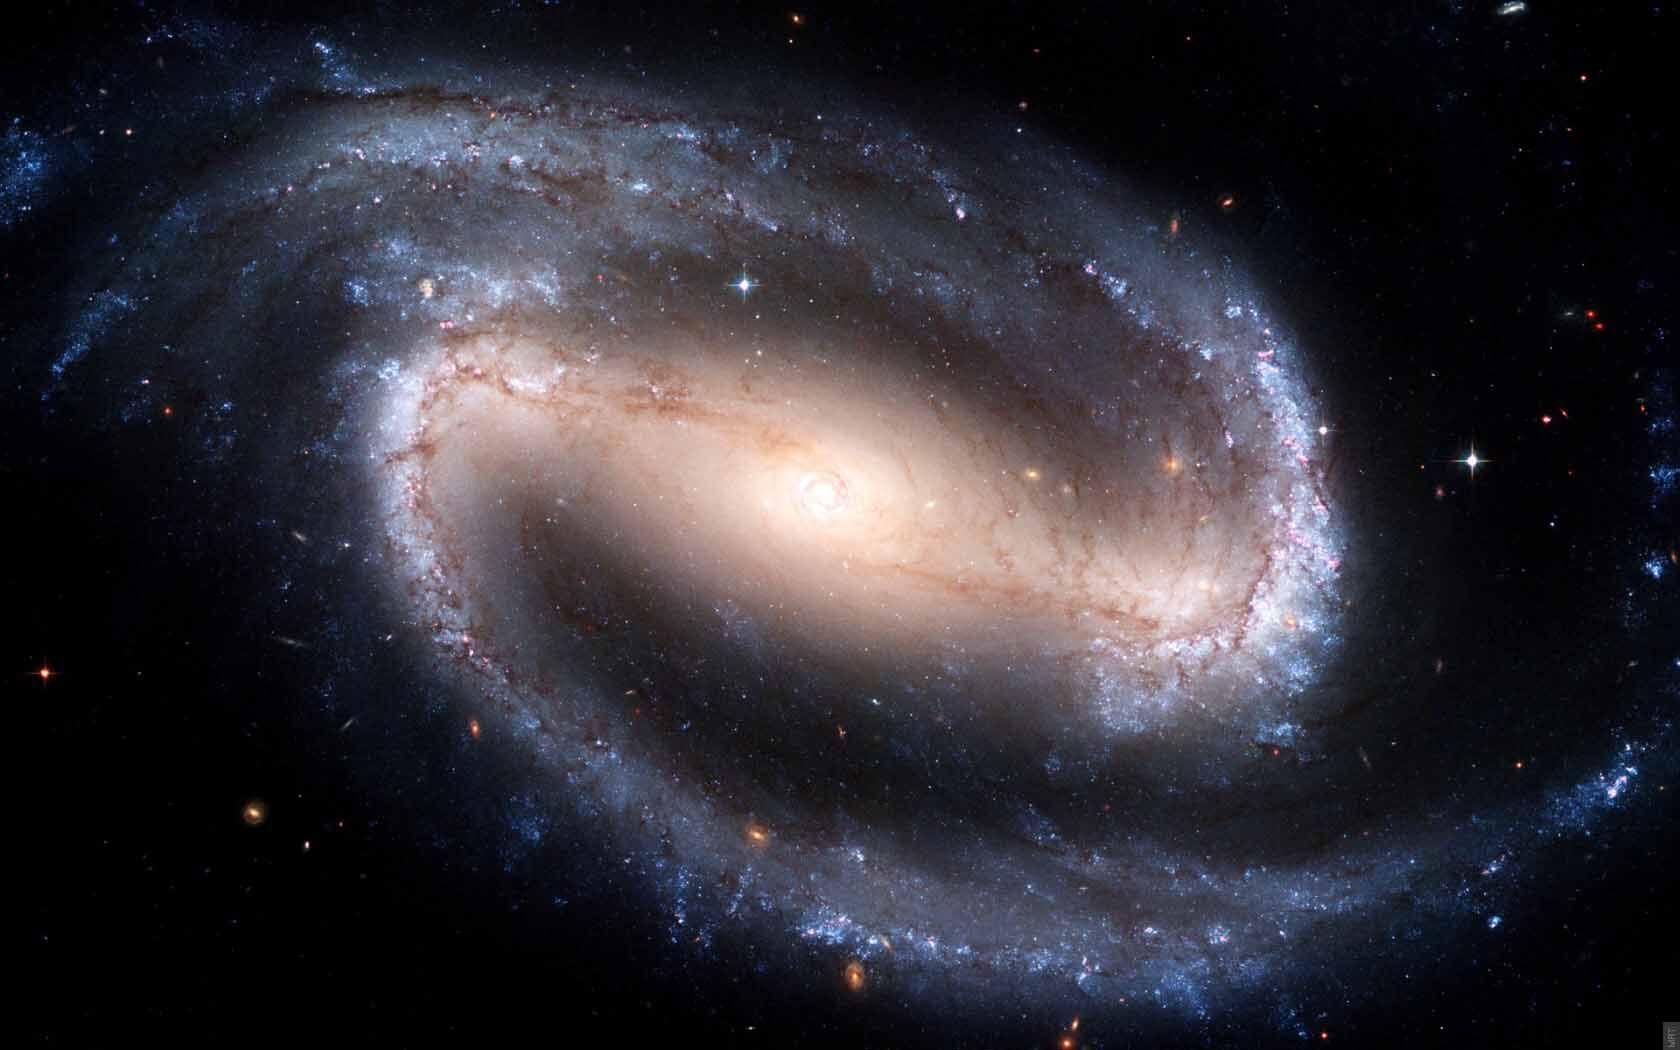 Neutrino what Neutrino means Spiral galaxy Hubble space 1680x1050